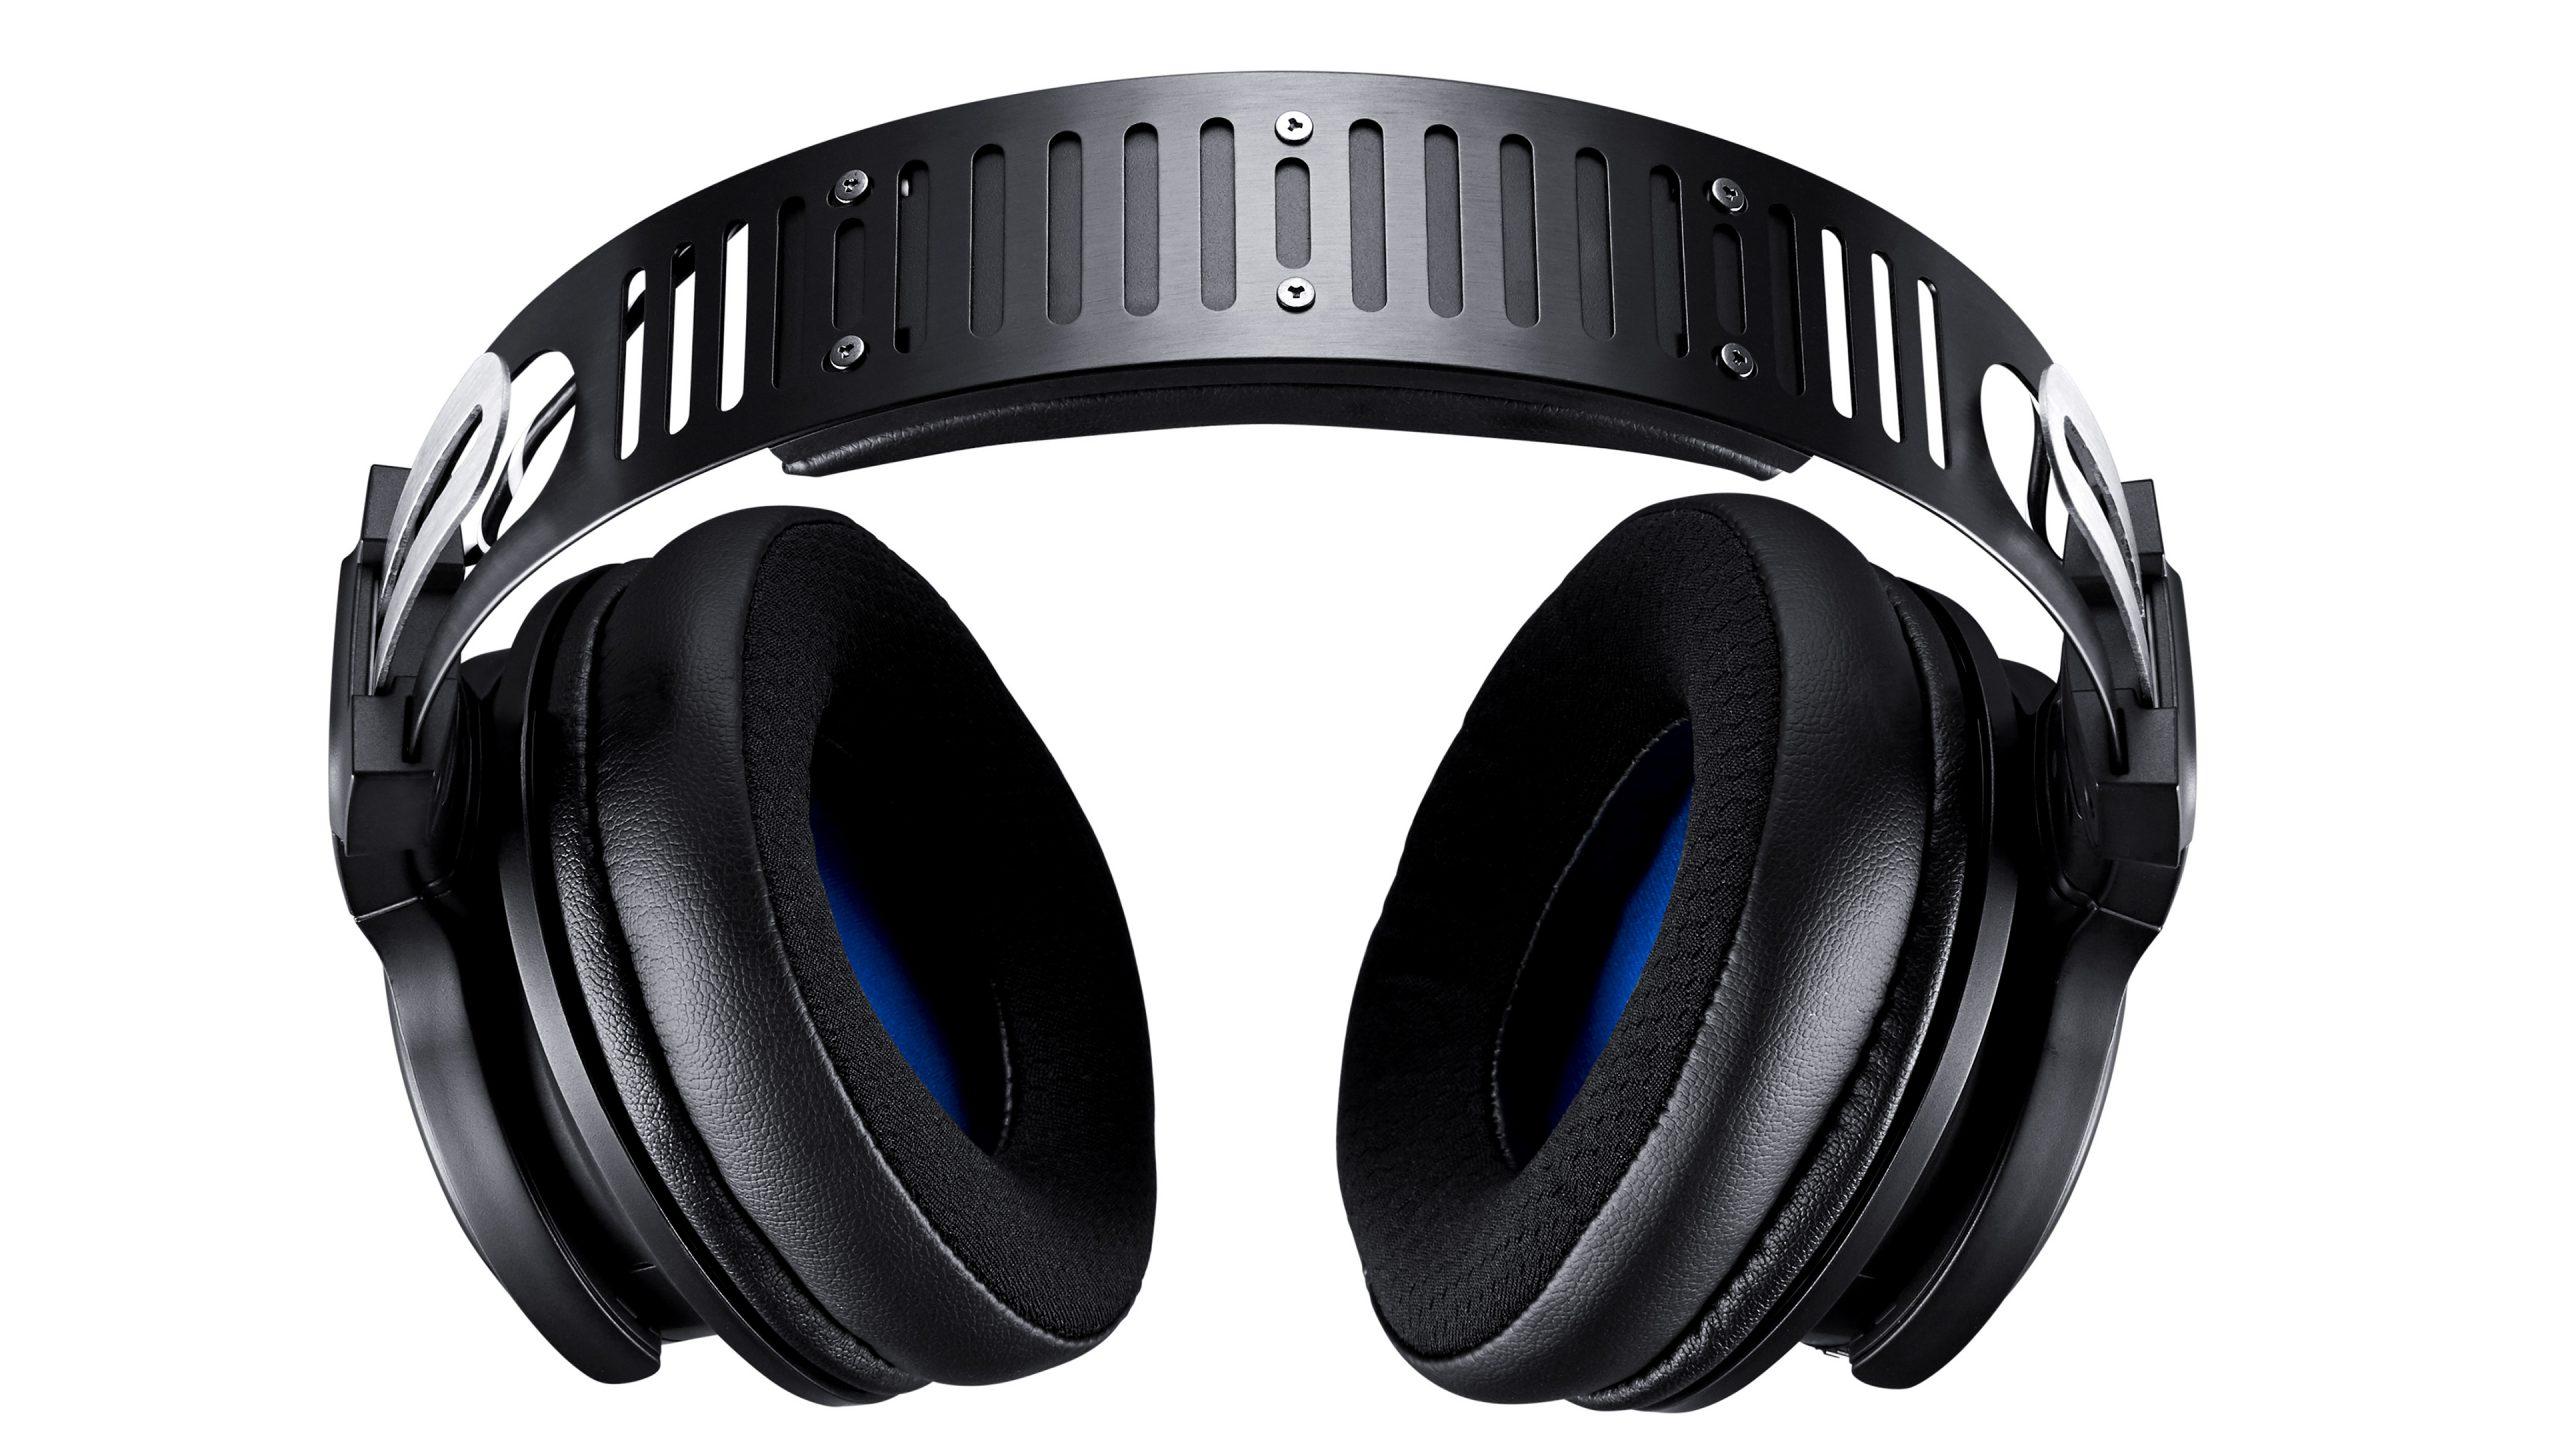 TEST: Vi tester 6 high end gaming headsets – Spillyd i